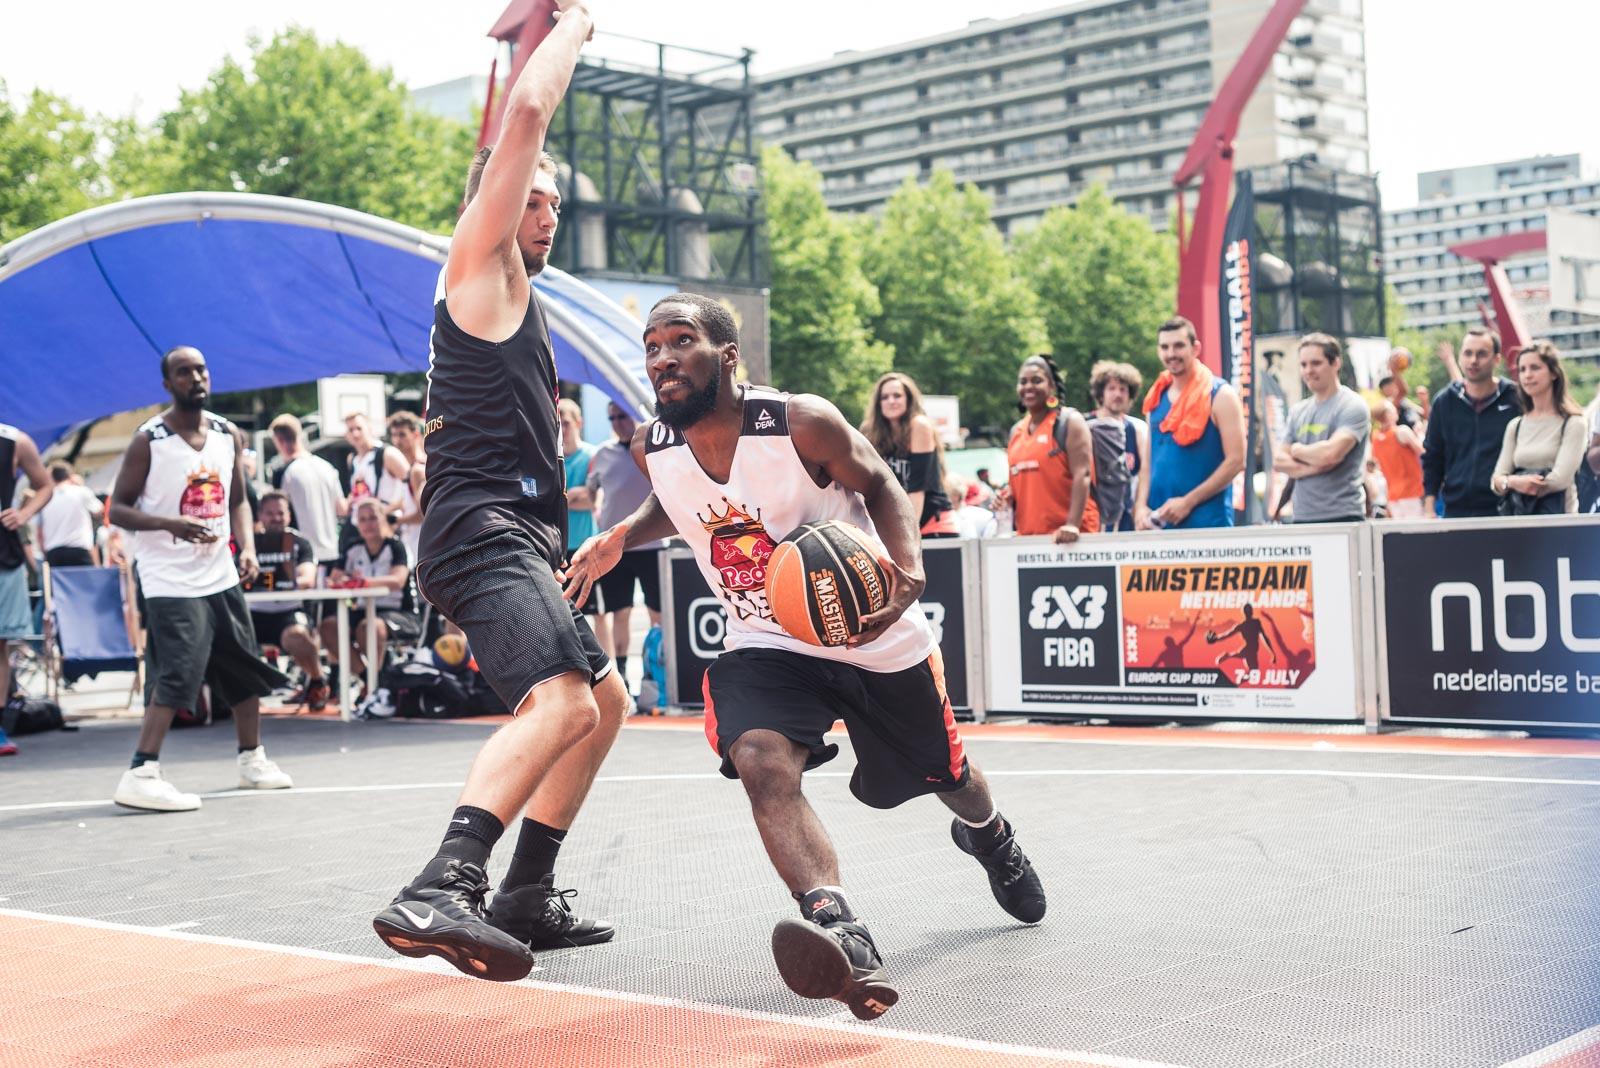 Basketball player driving the ball to the basket